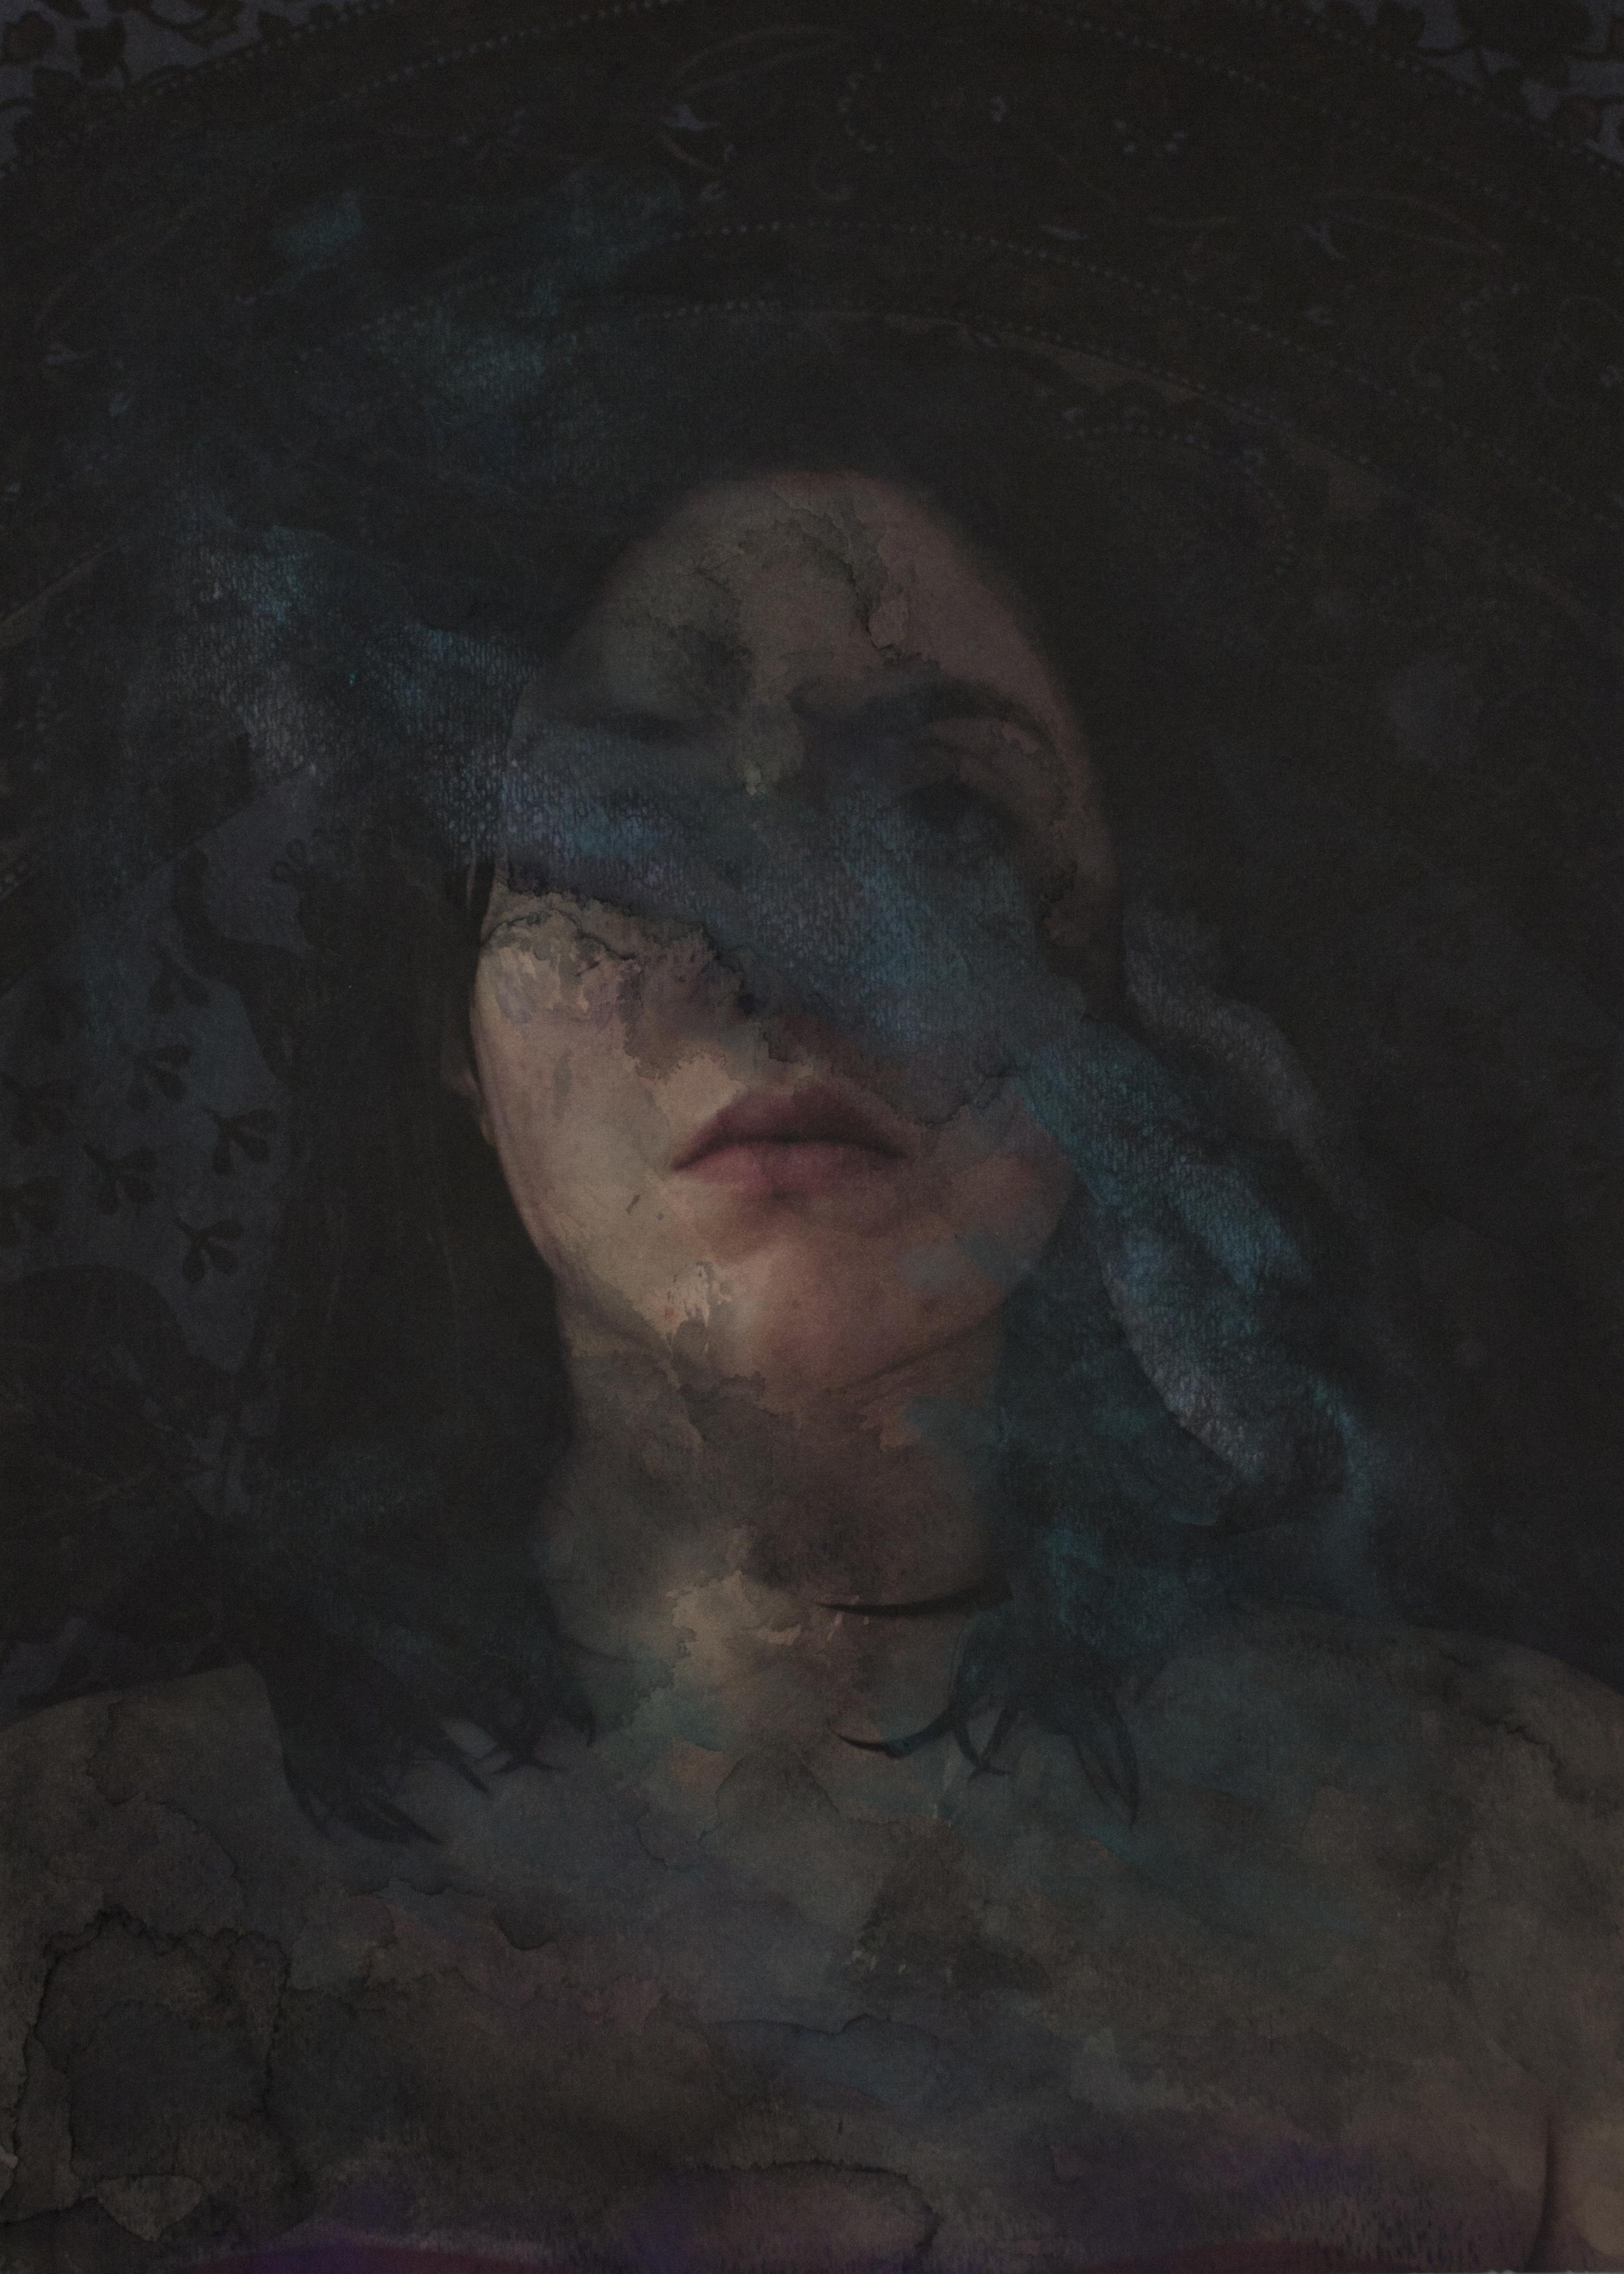 Krista Adams, 2014